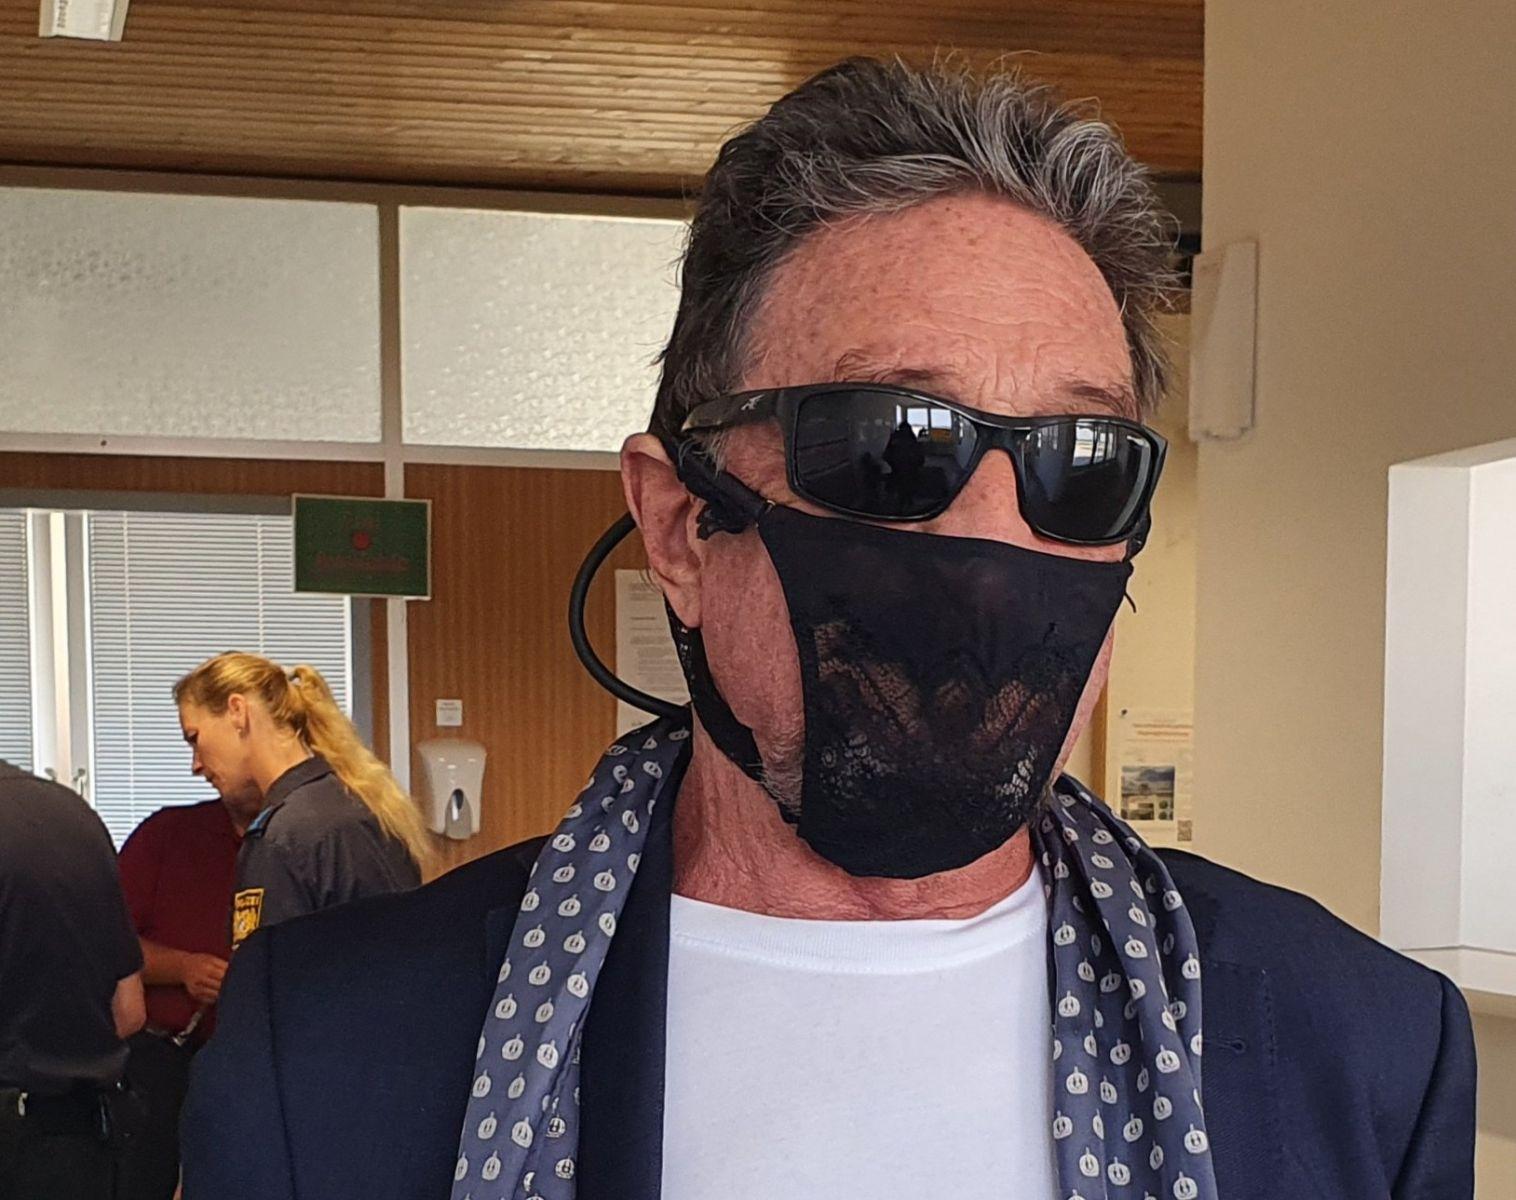 Американский магнат Джон Макафи был арестован за то, что надел на лицо ж...